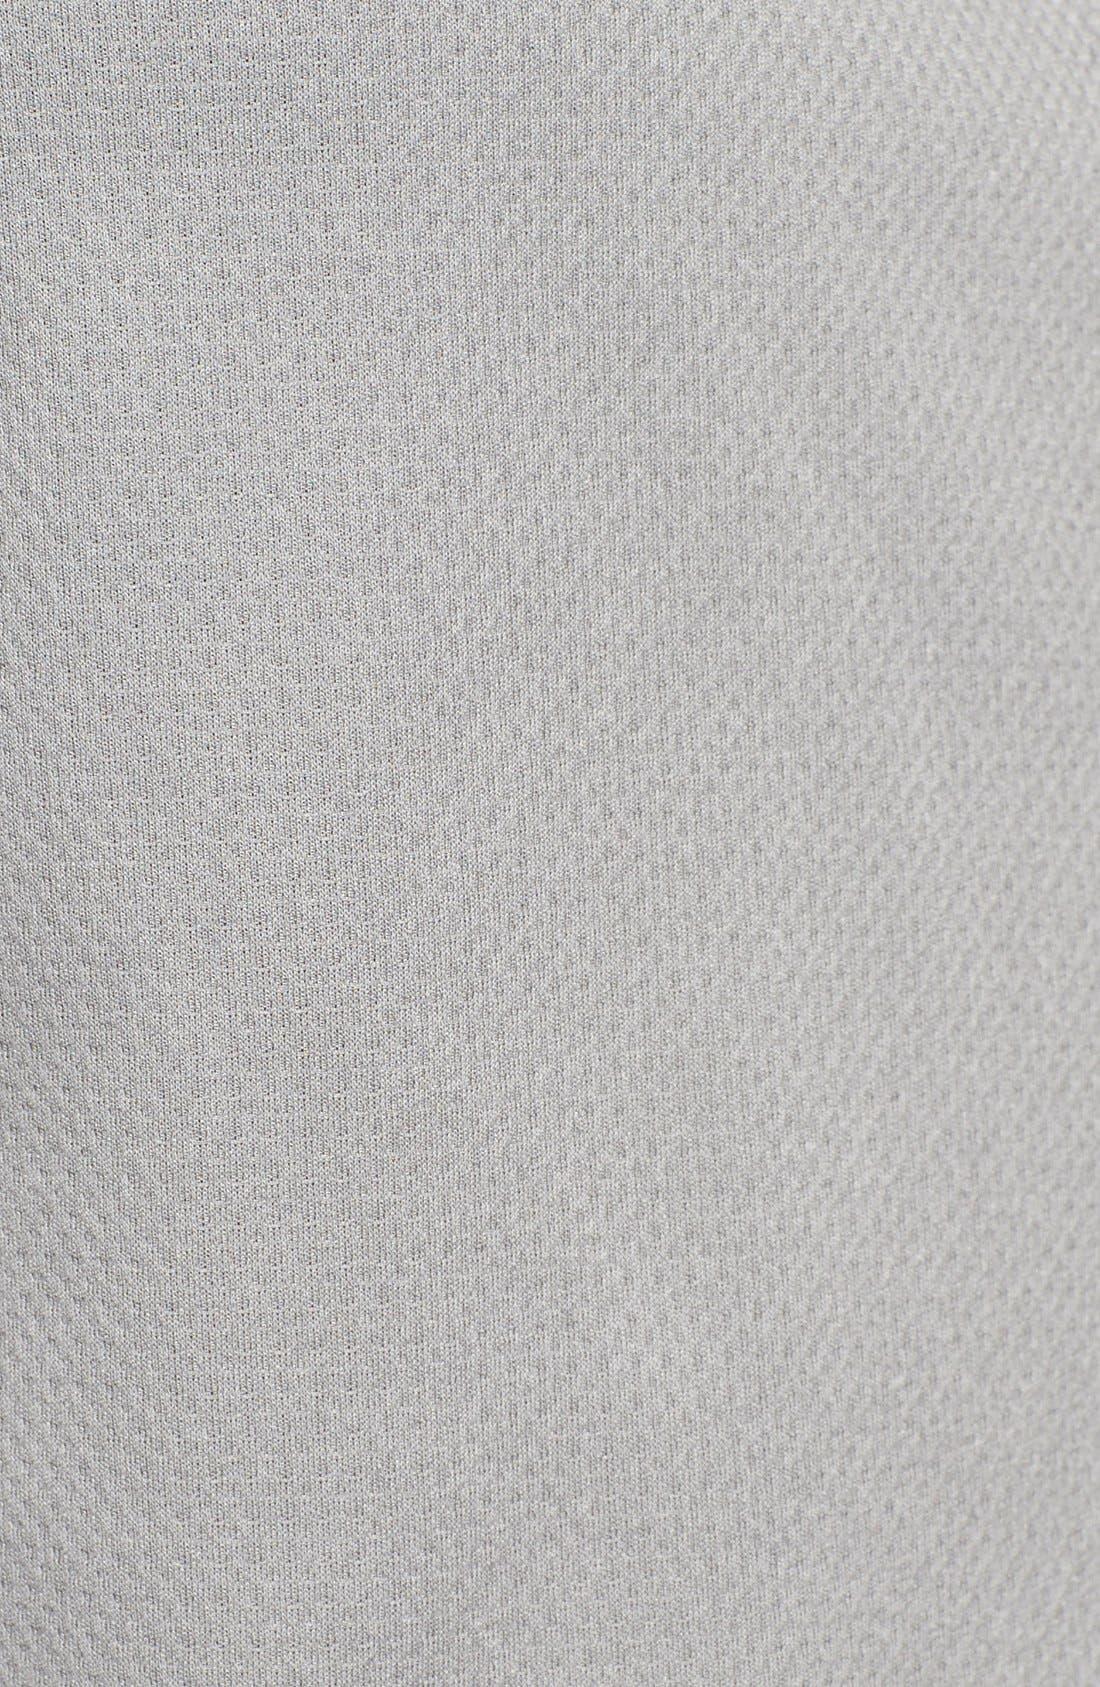 Alternate Image 4  - Under Armour 'Reflex' HeatGear® Mesh Knit Shorts